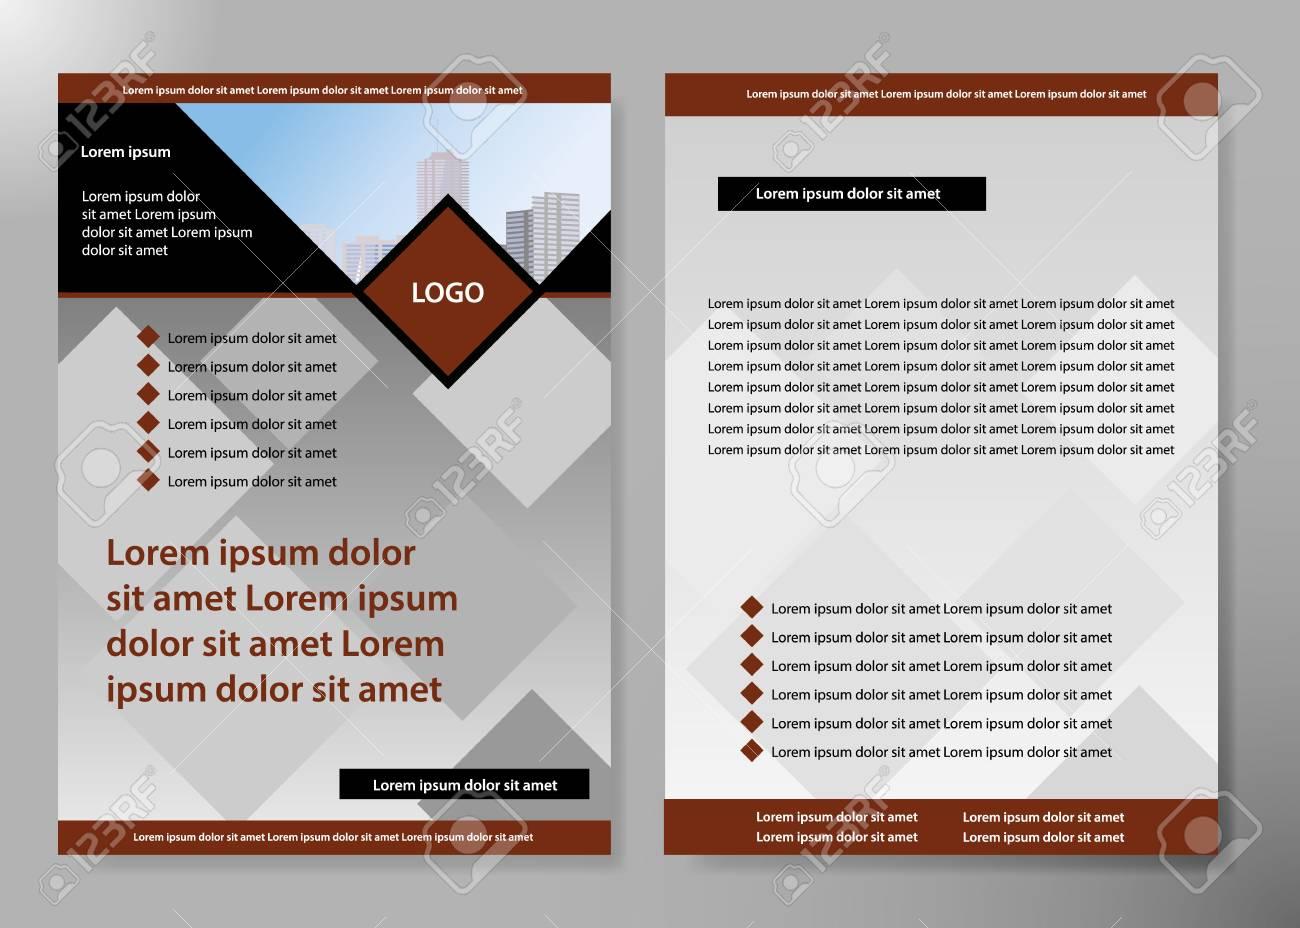 Minimal Flyers Report Business Magazine Poster Layout Portfolio TemplateBrochure Design Template VectorSquare